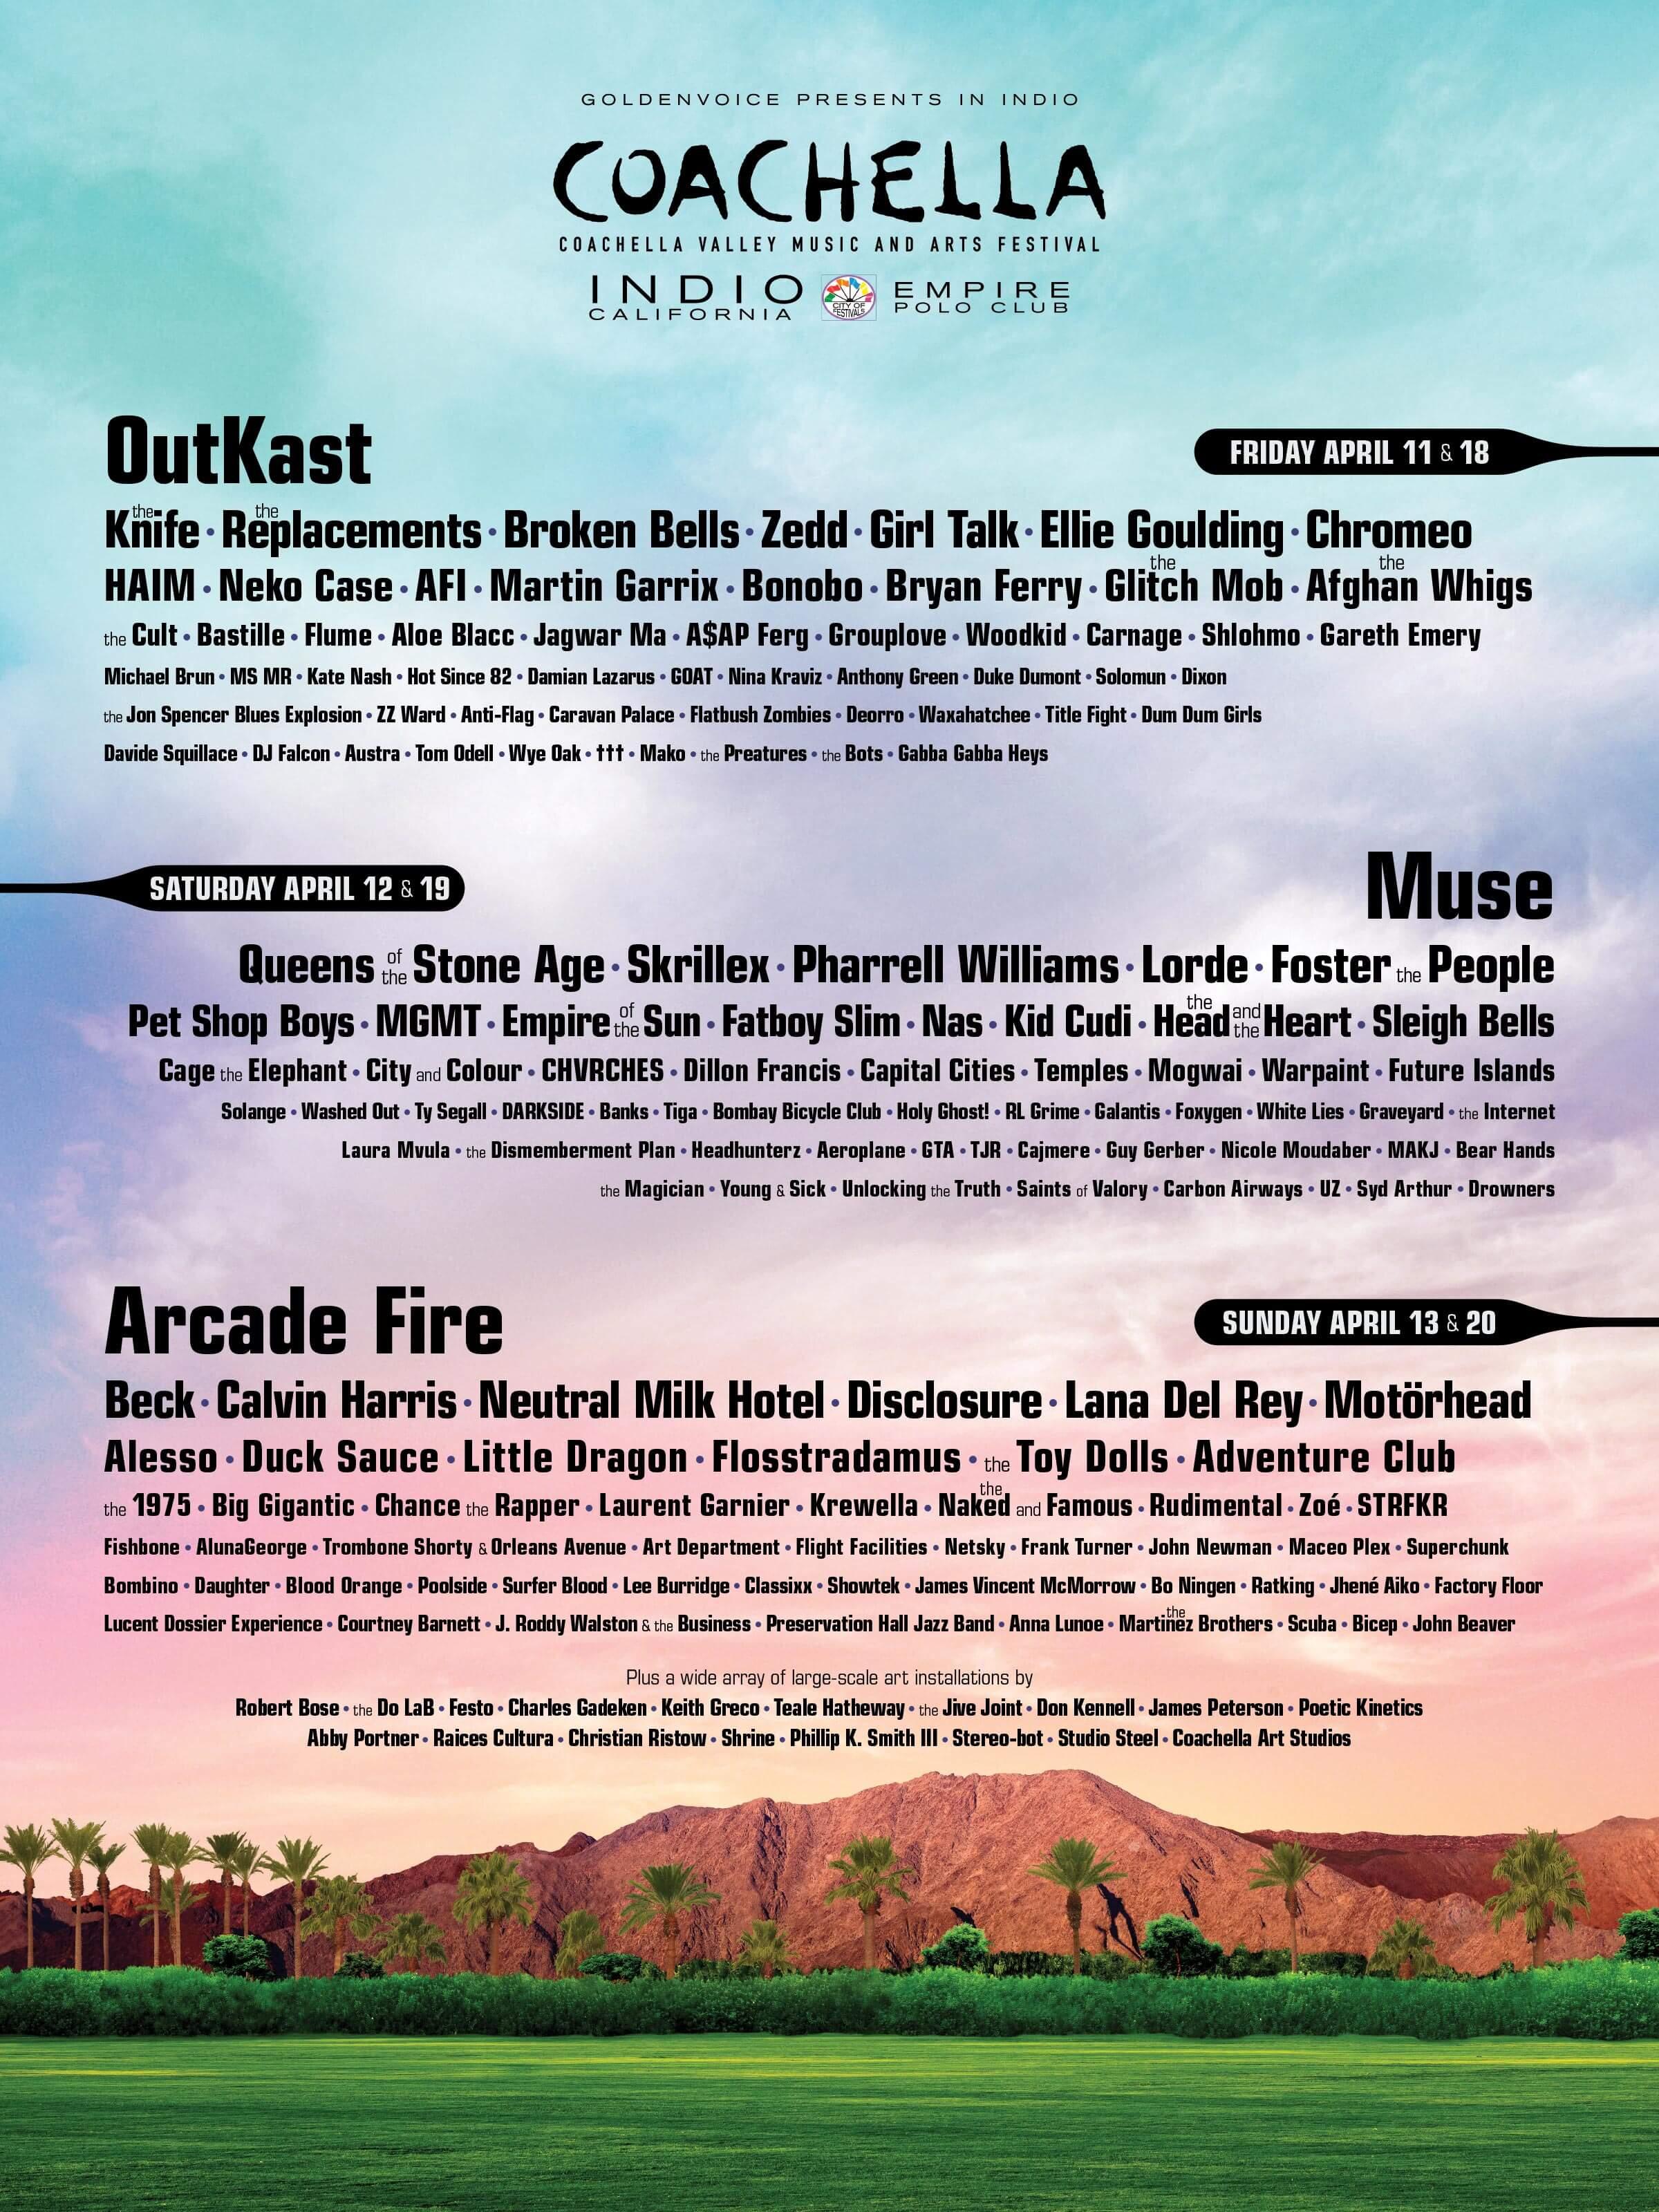 Coachella 2014 Lineup Poster